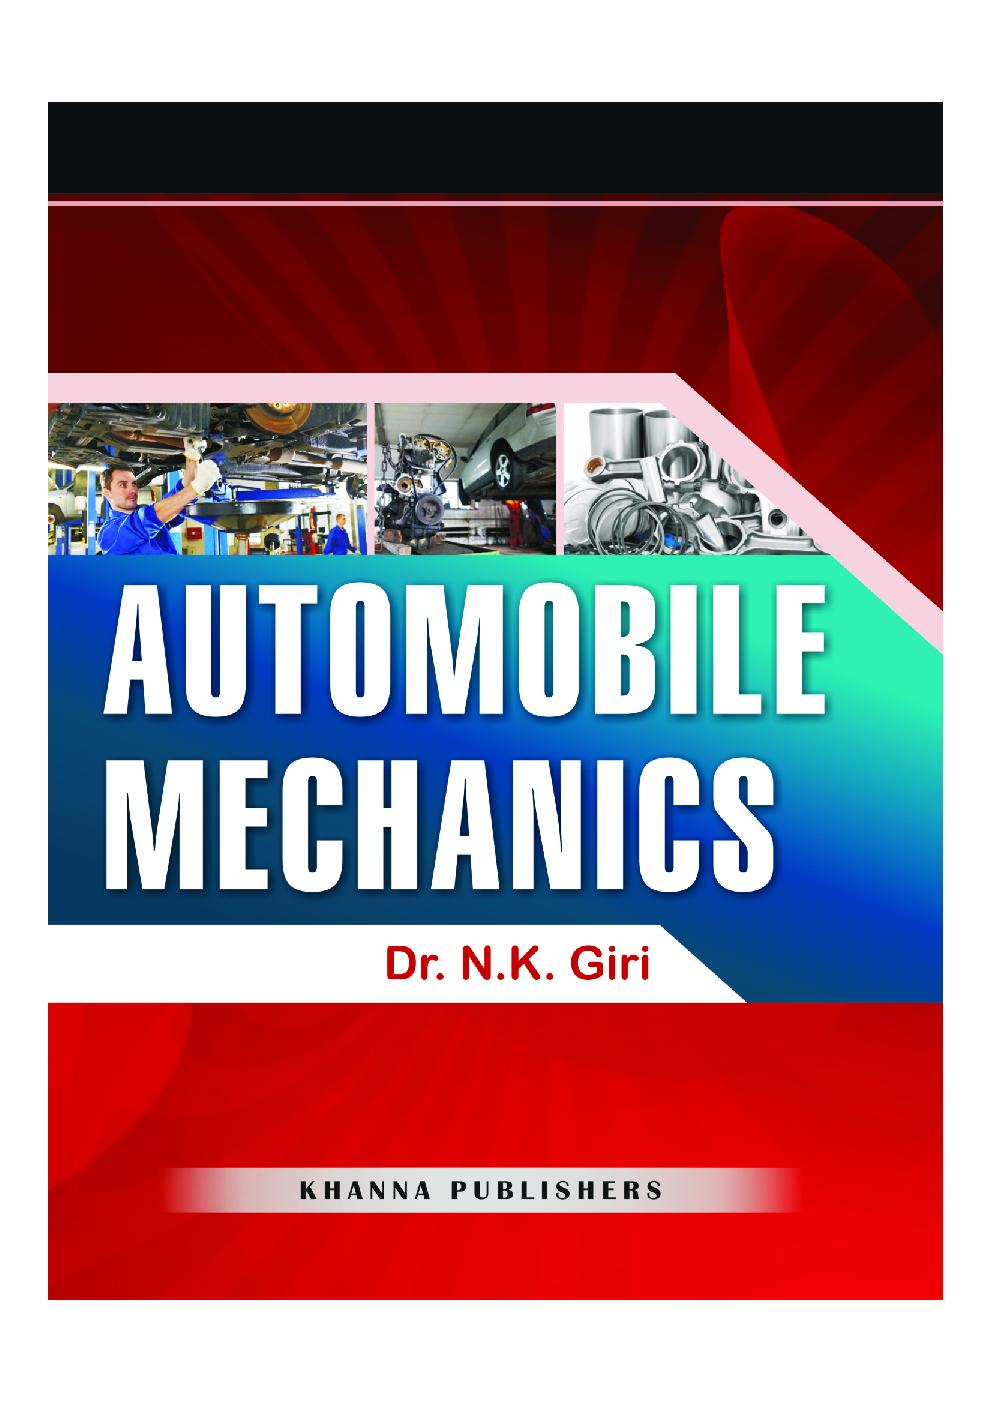 Automobile Mechanics - Page 1